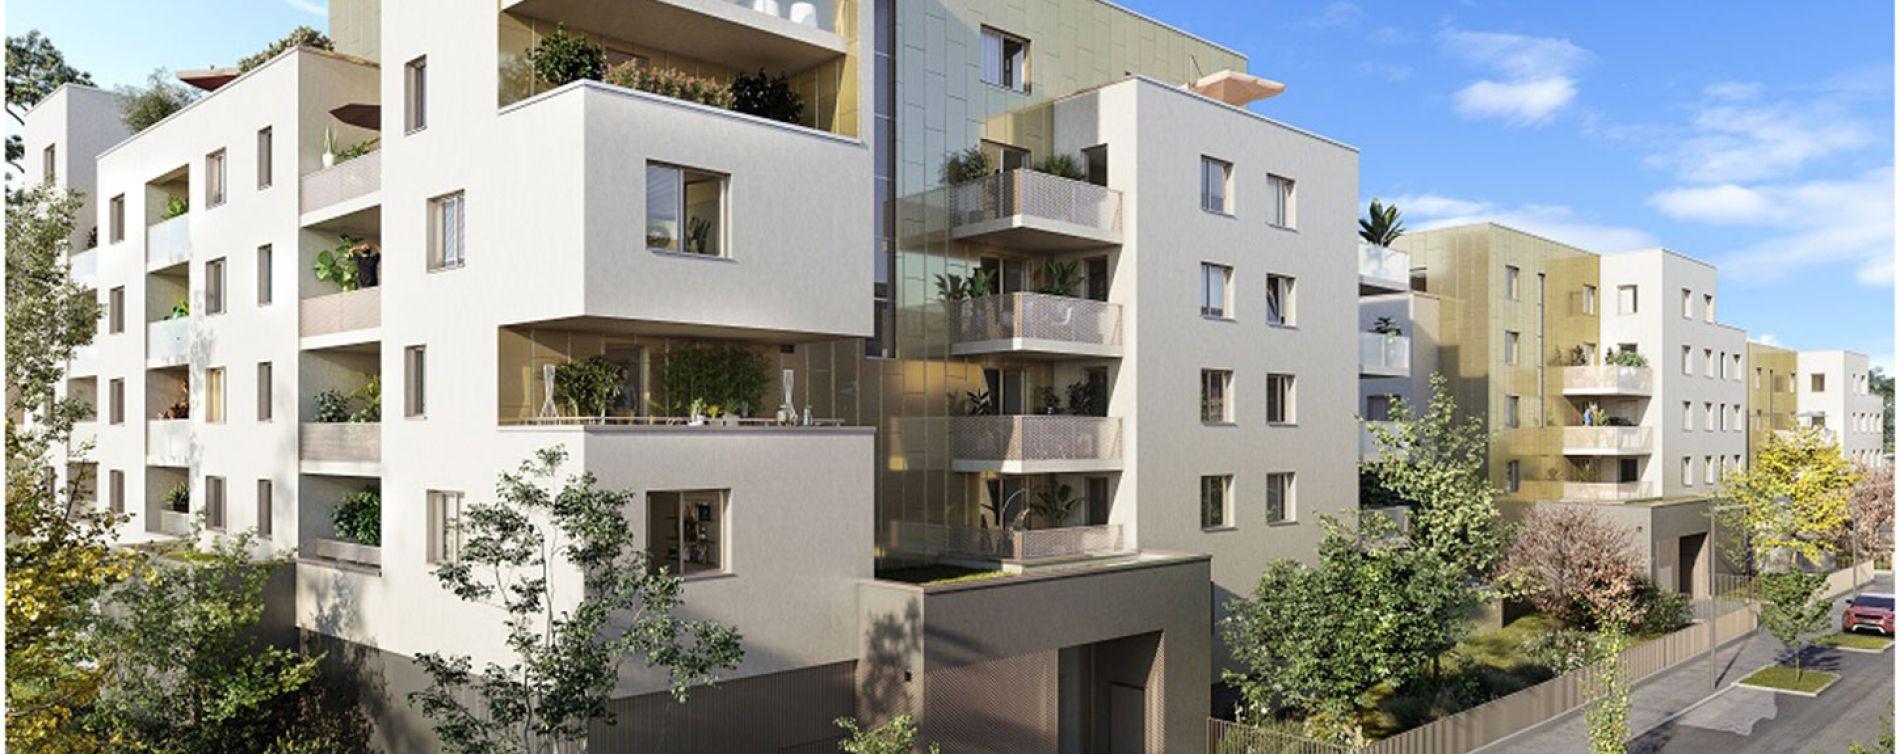 Lingolsheim : programme immobilier neuve « Green Square - Tranche 2 »